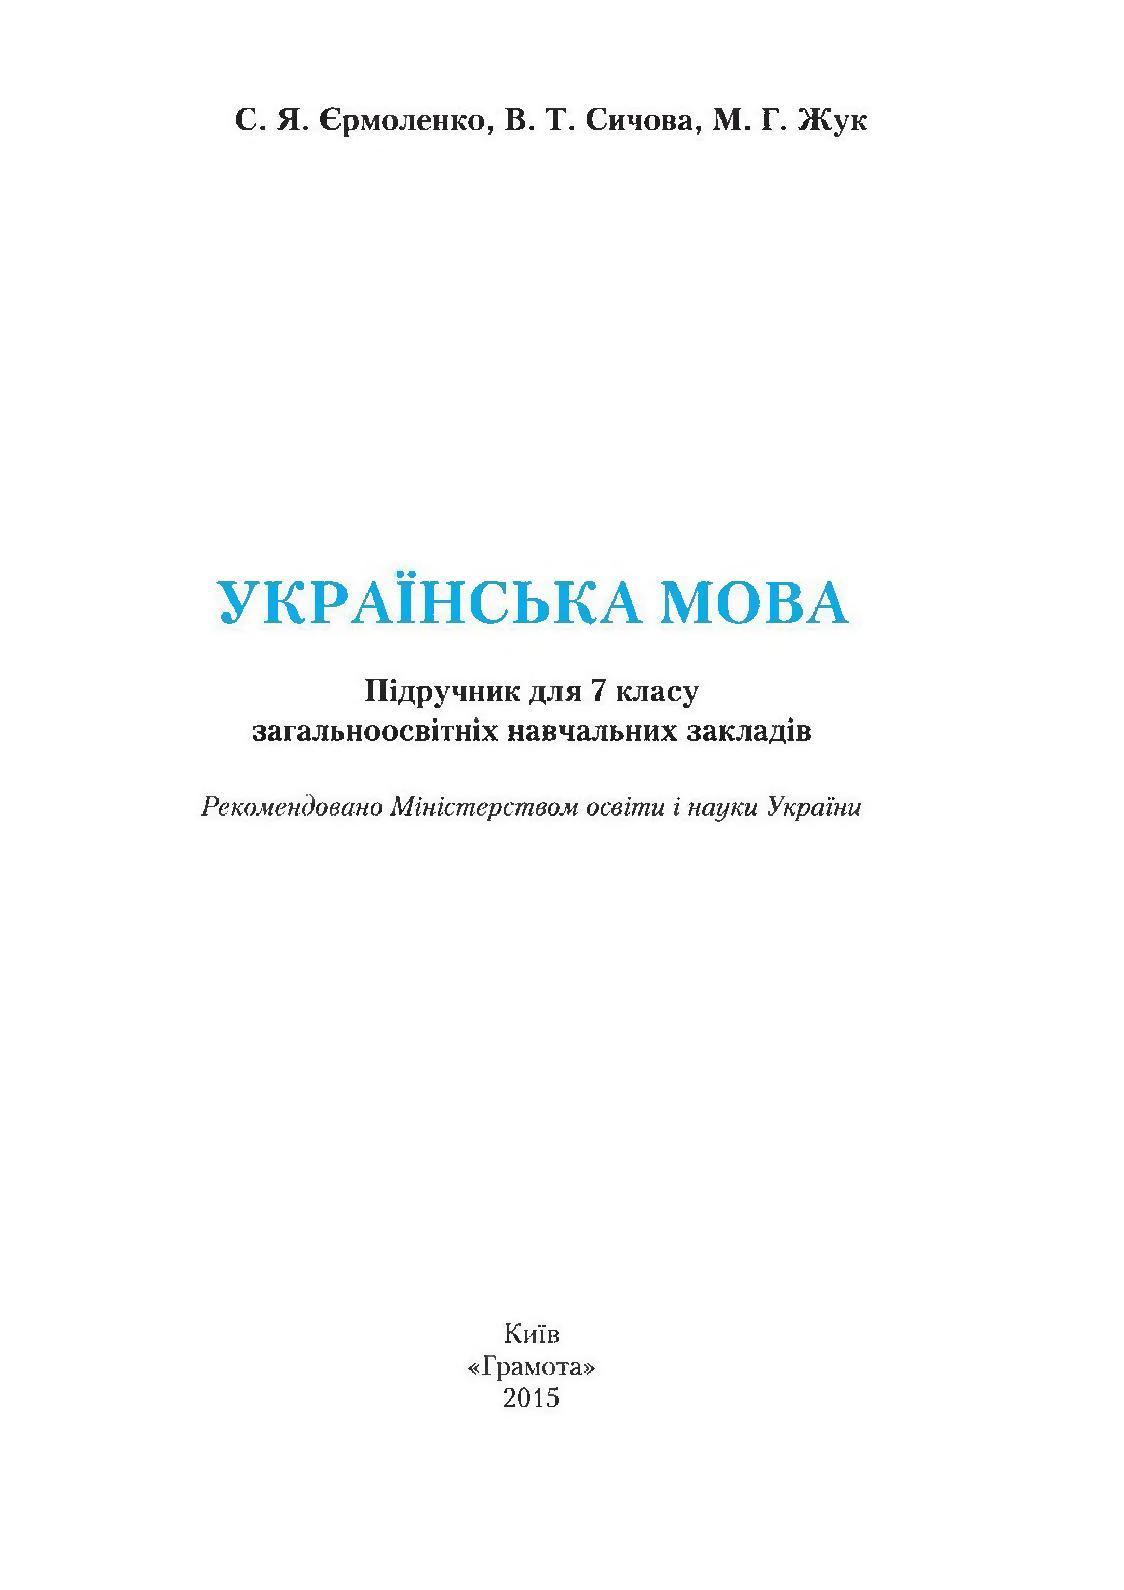 Calaméo - Українська мова 7 клас f95cc5efc69f9